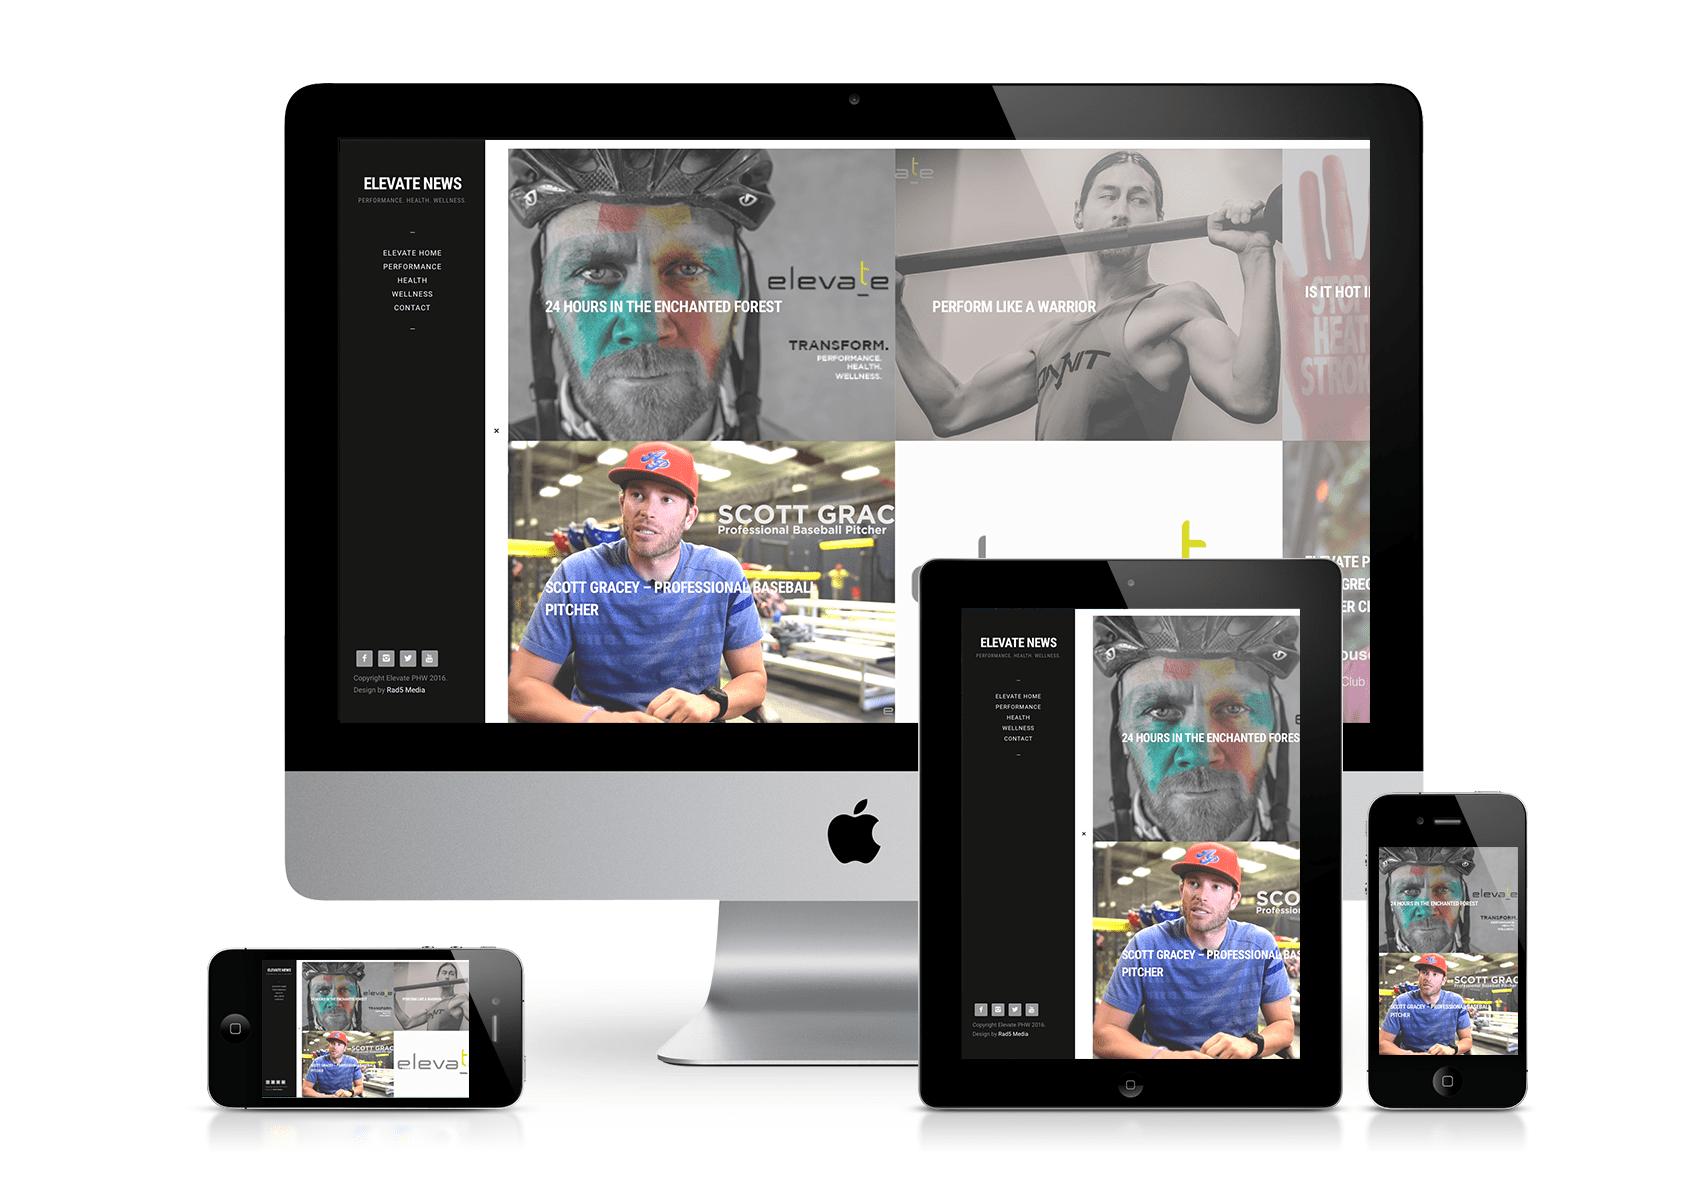 Rad5-Media-elevate-phw-content-marketing-strategy